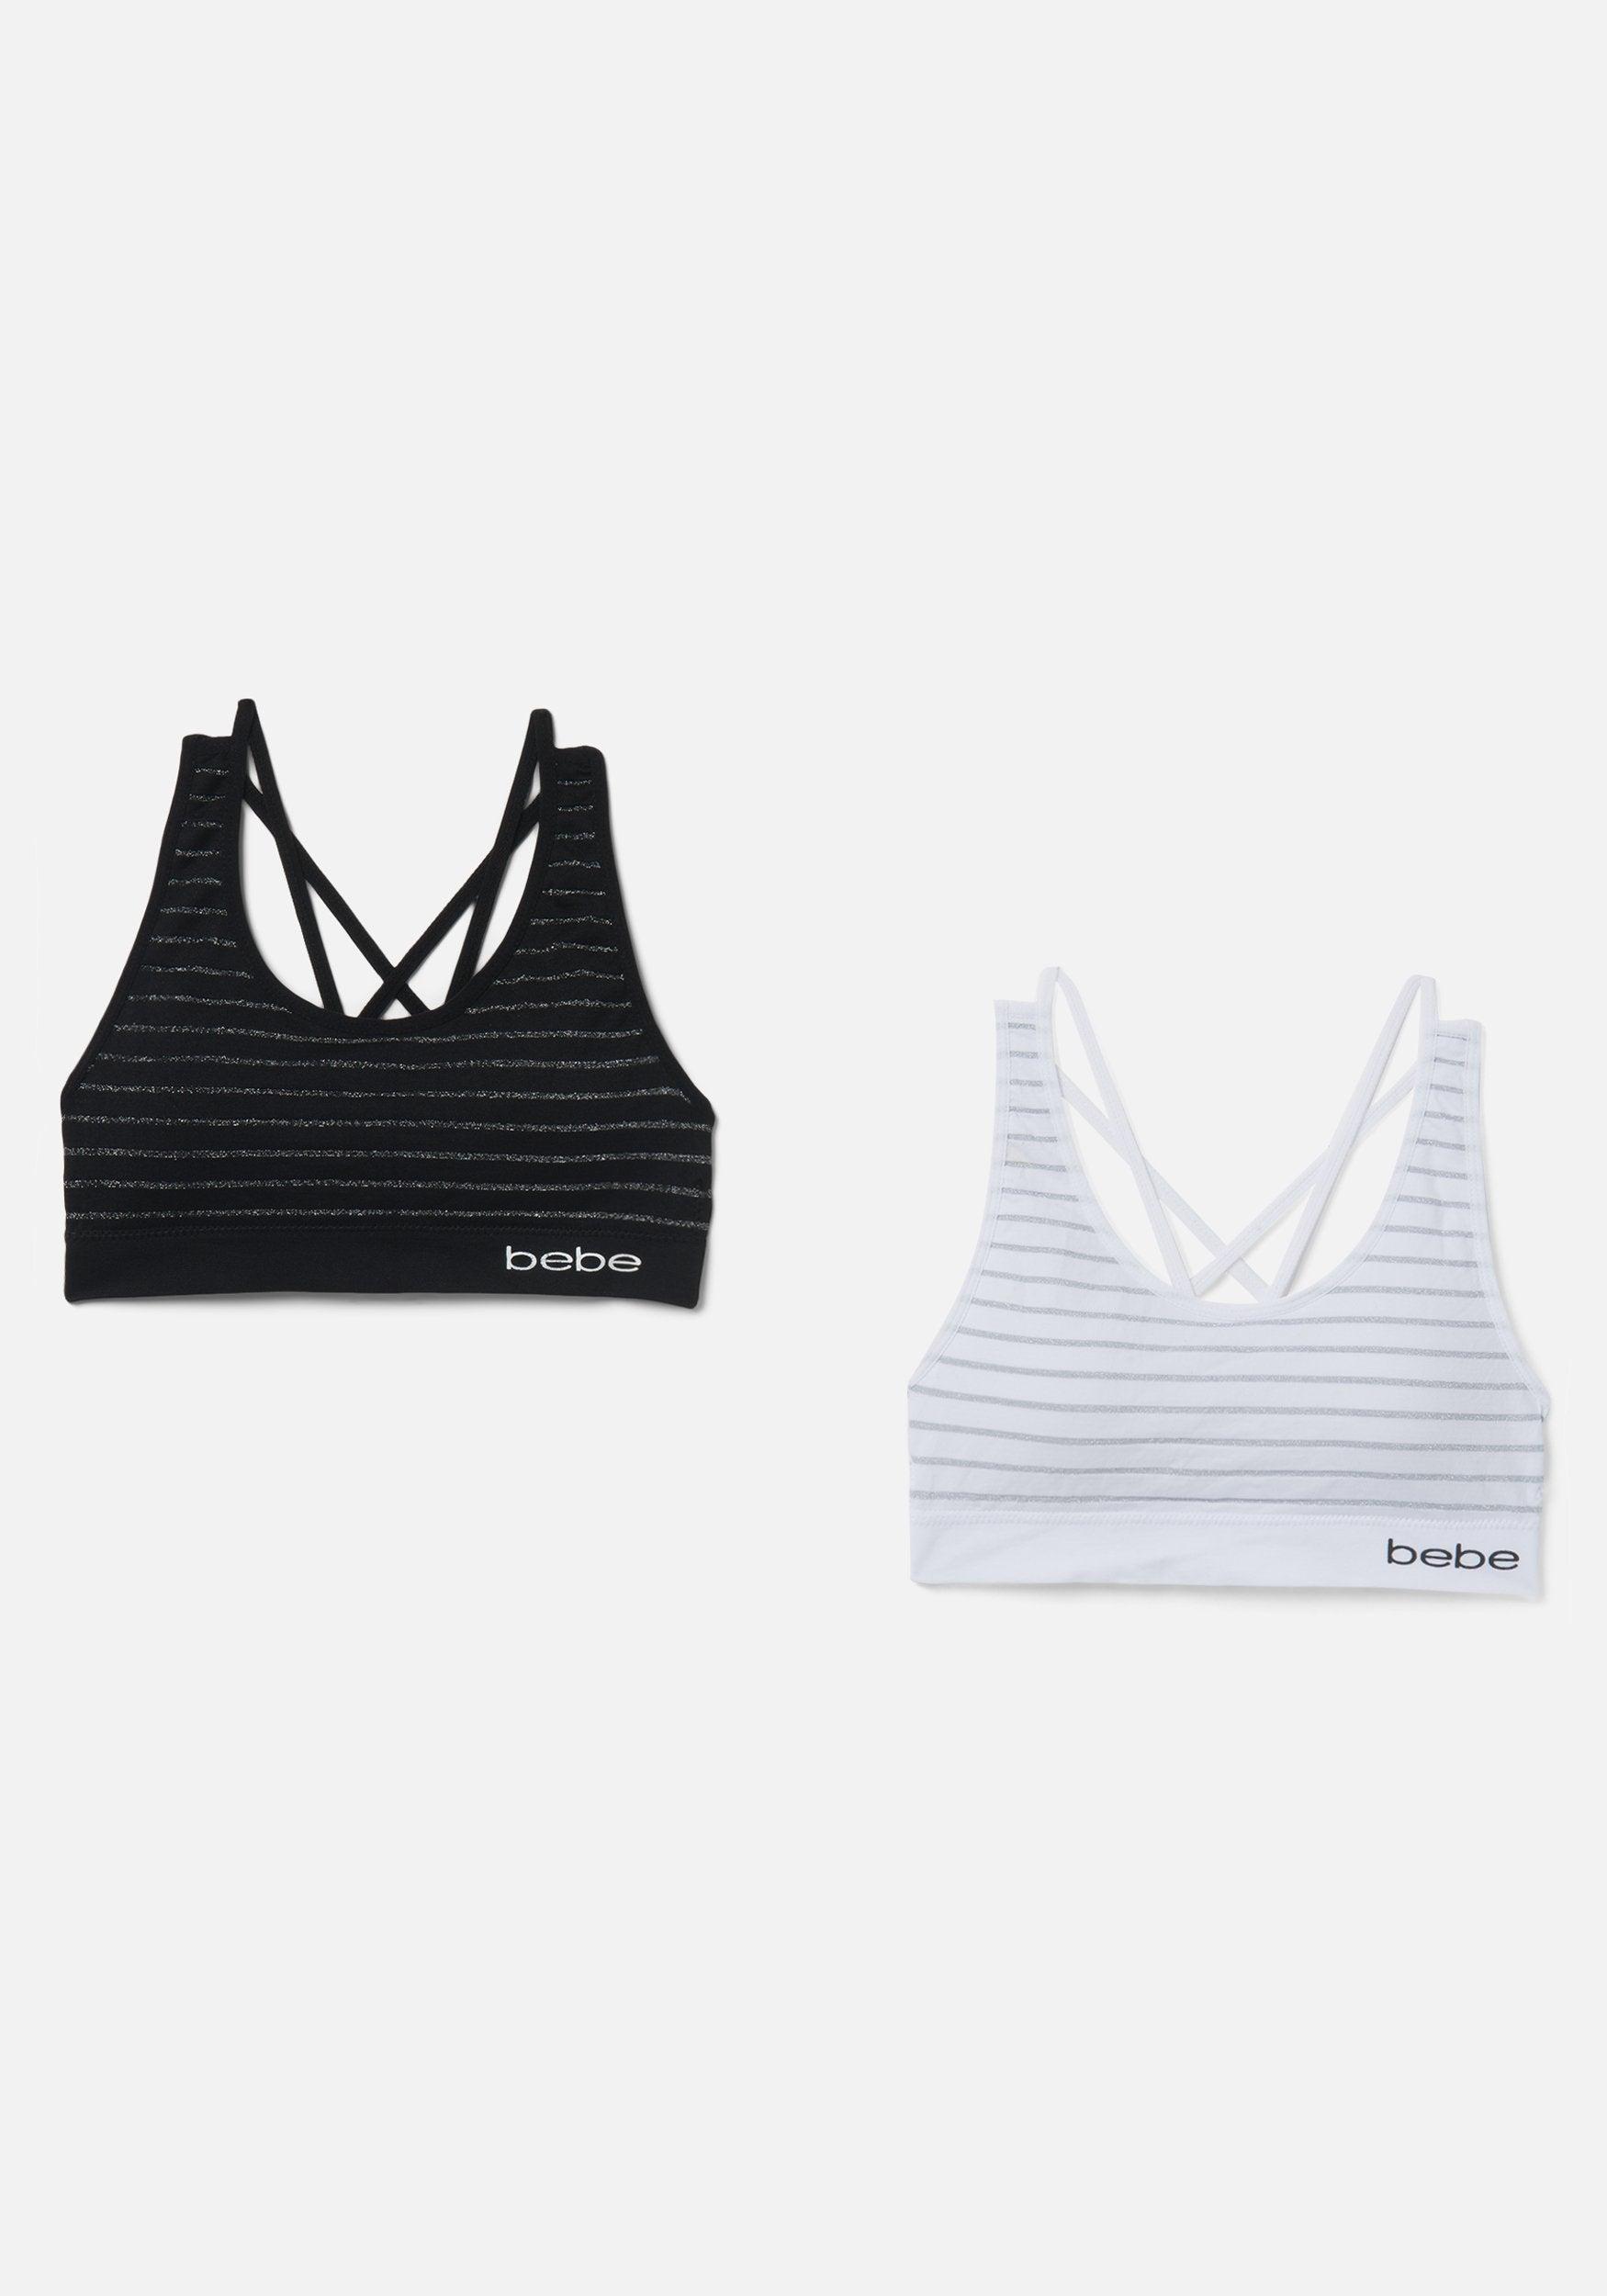 Bebe Women's 2 Pack Stripe Sports Bra, Size Medium in Whiteout Spandex/Nylon